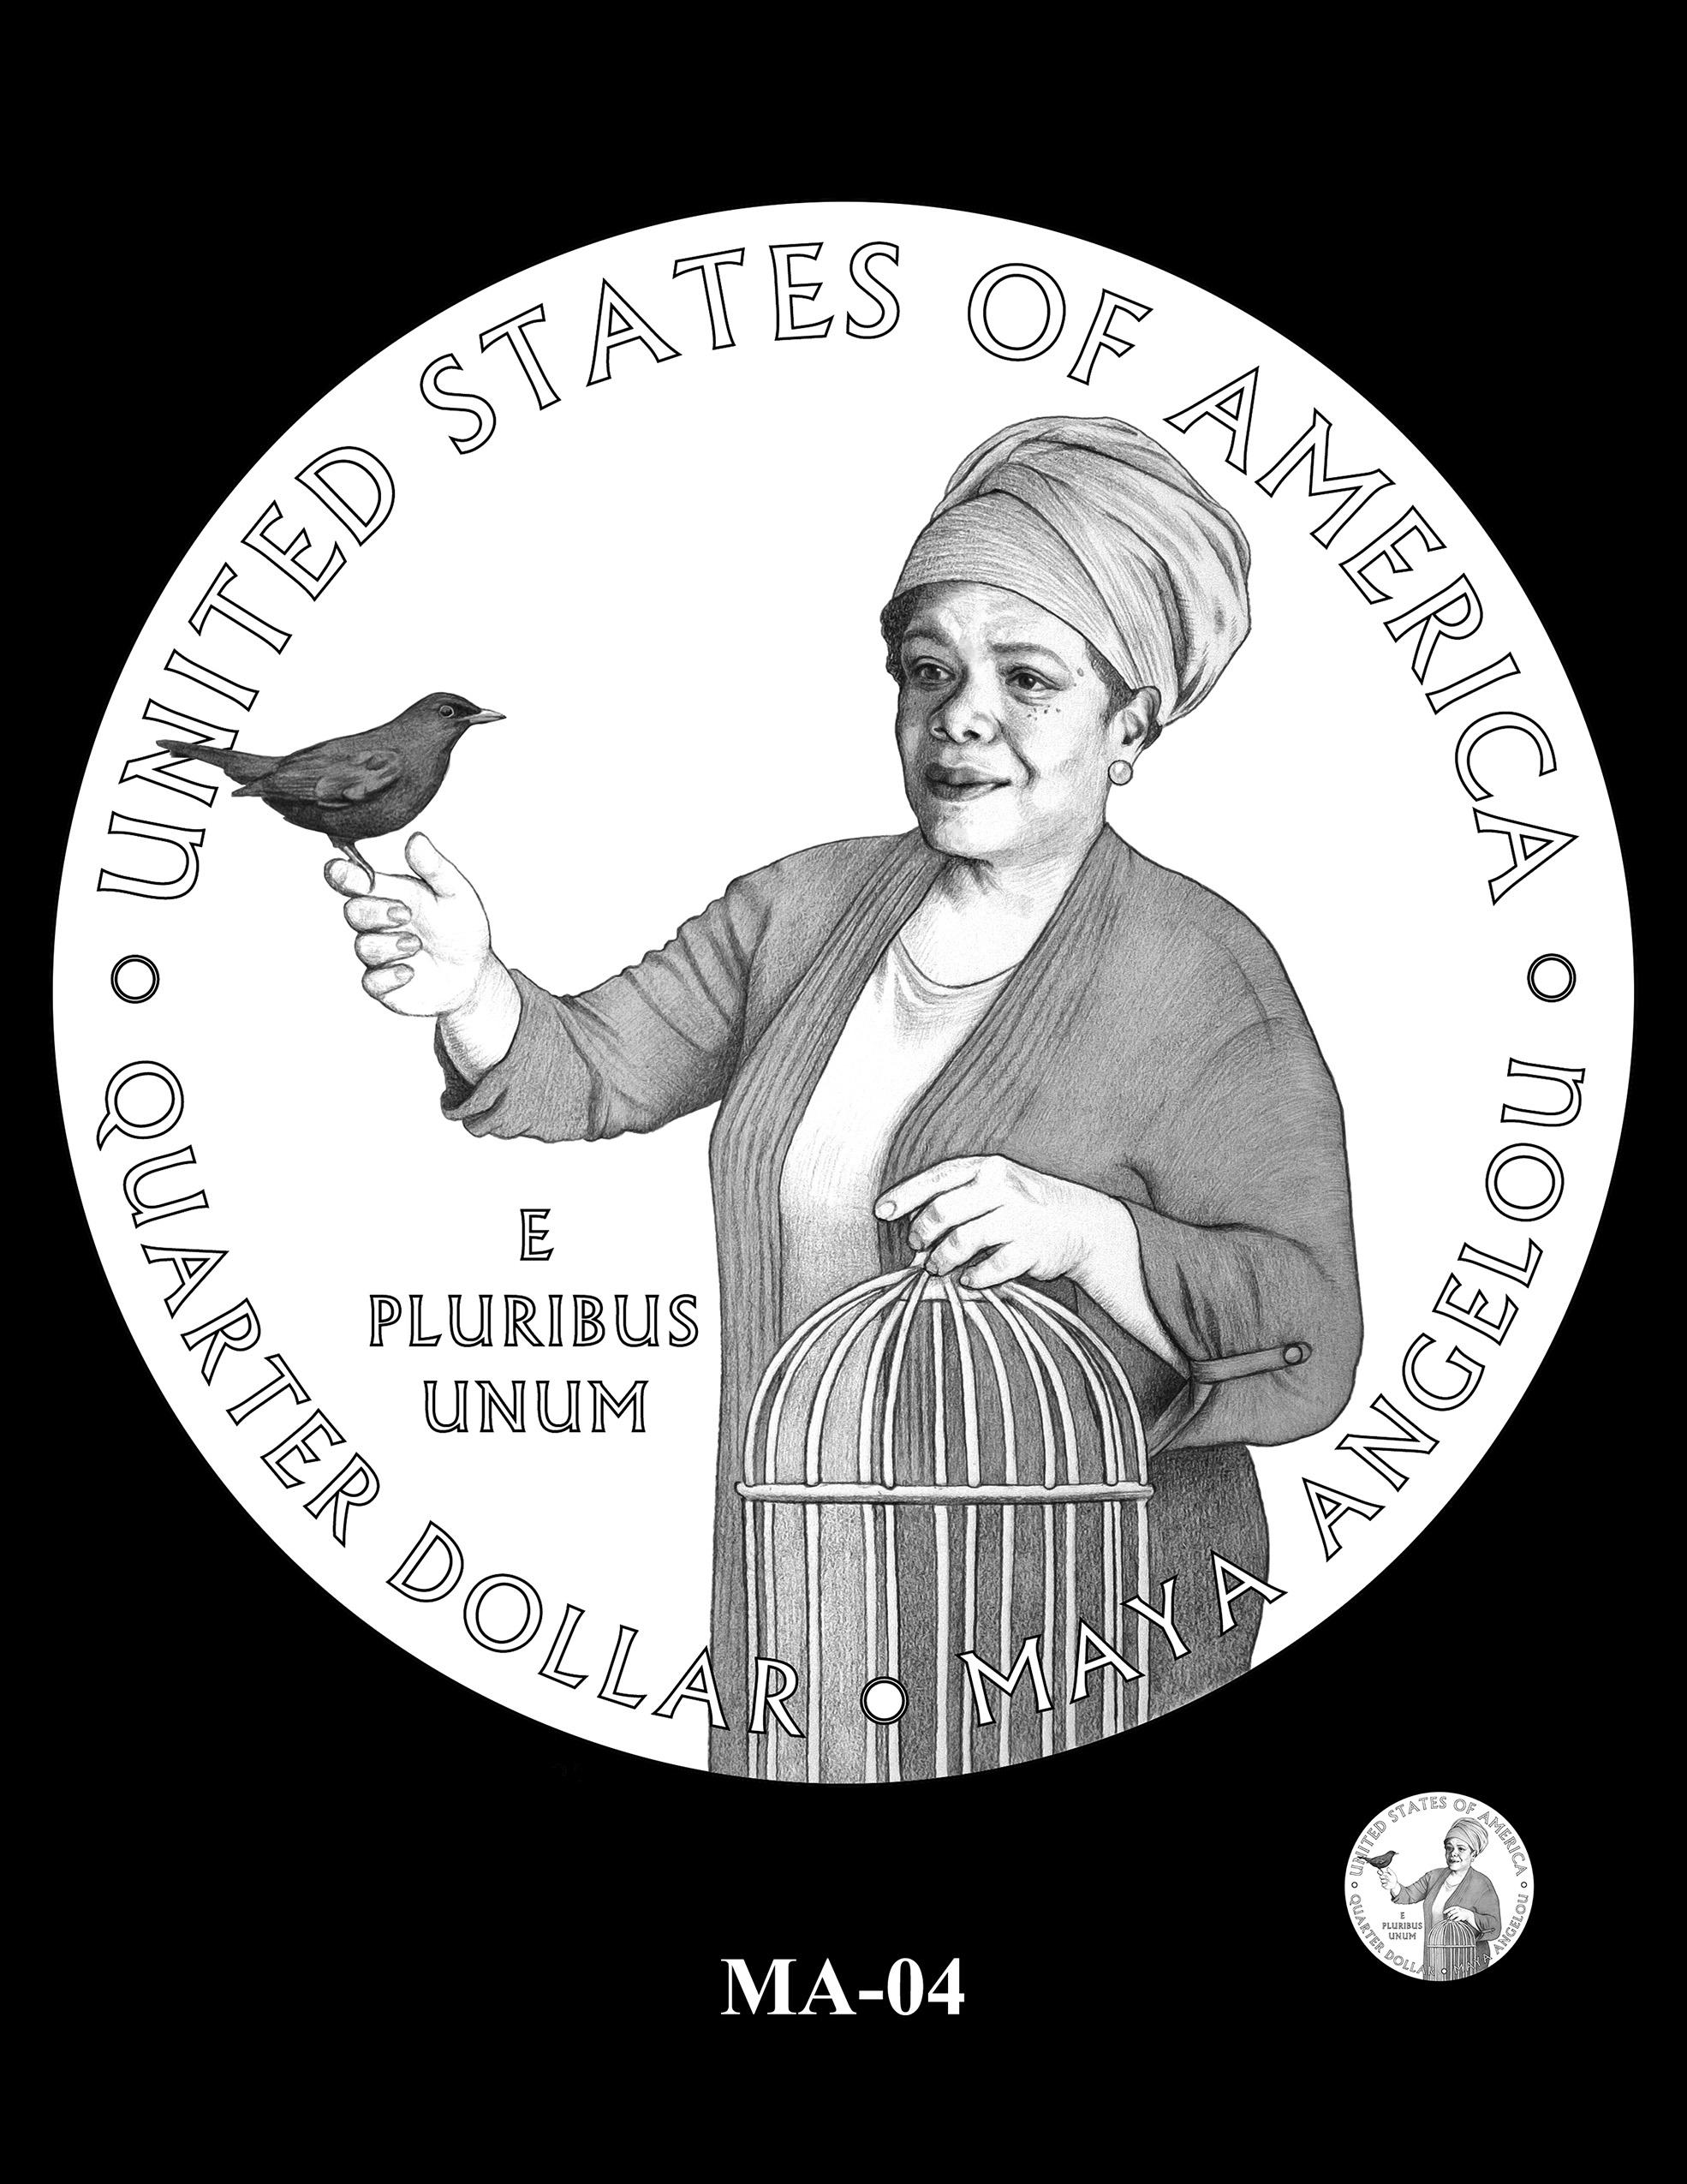 MA-04 -- 2022 American Women Quarters - Maya Angelou Reverse